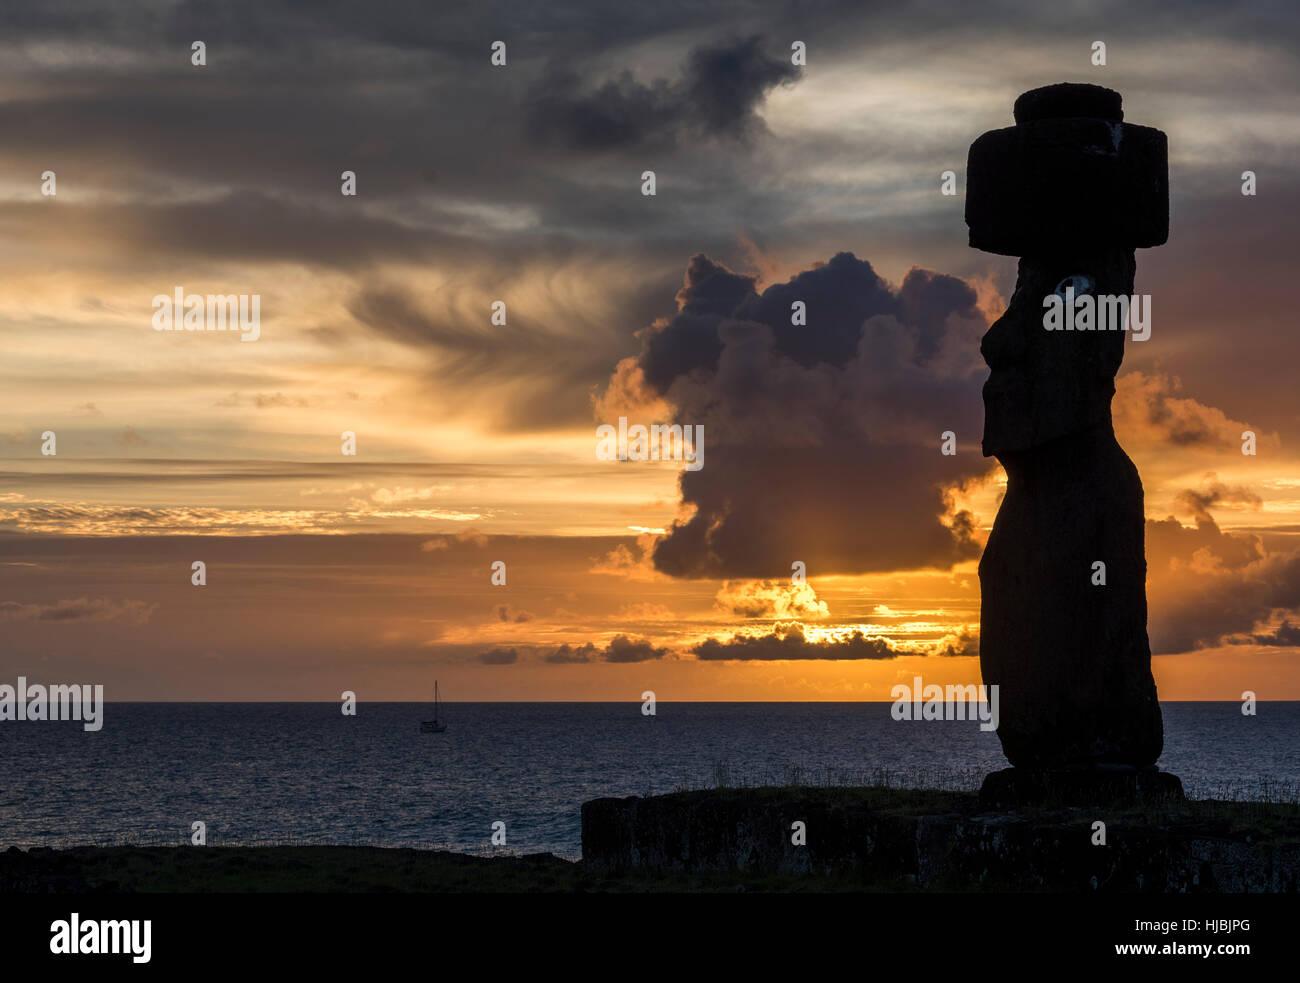 Statues ( moai) on easter island , chile - Stock Image